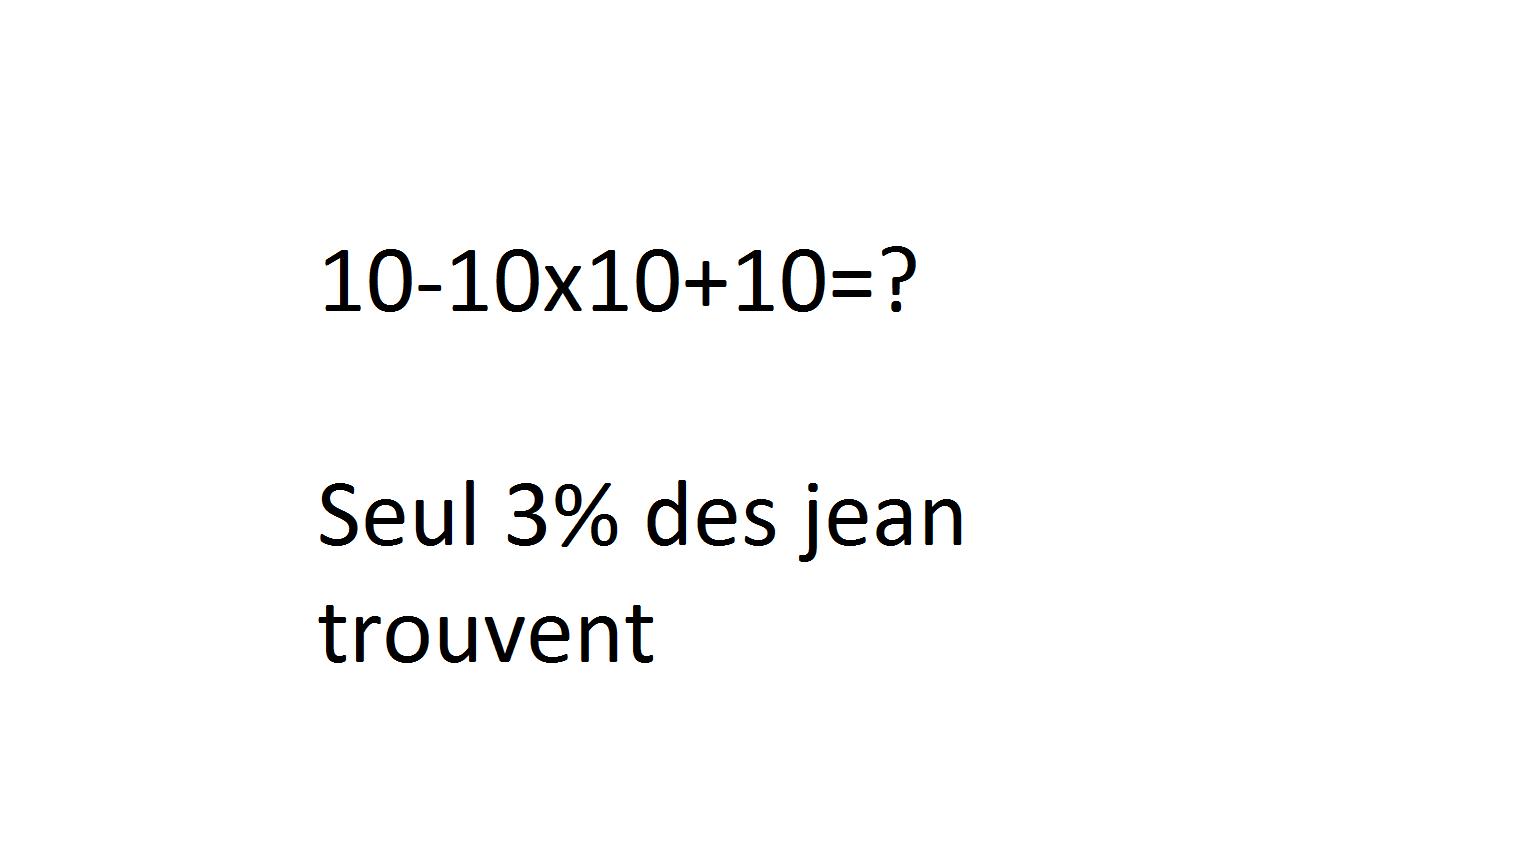 10-10x10+10